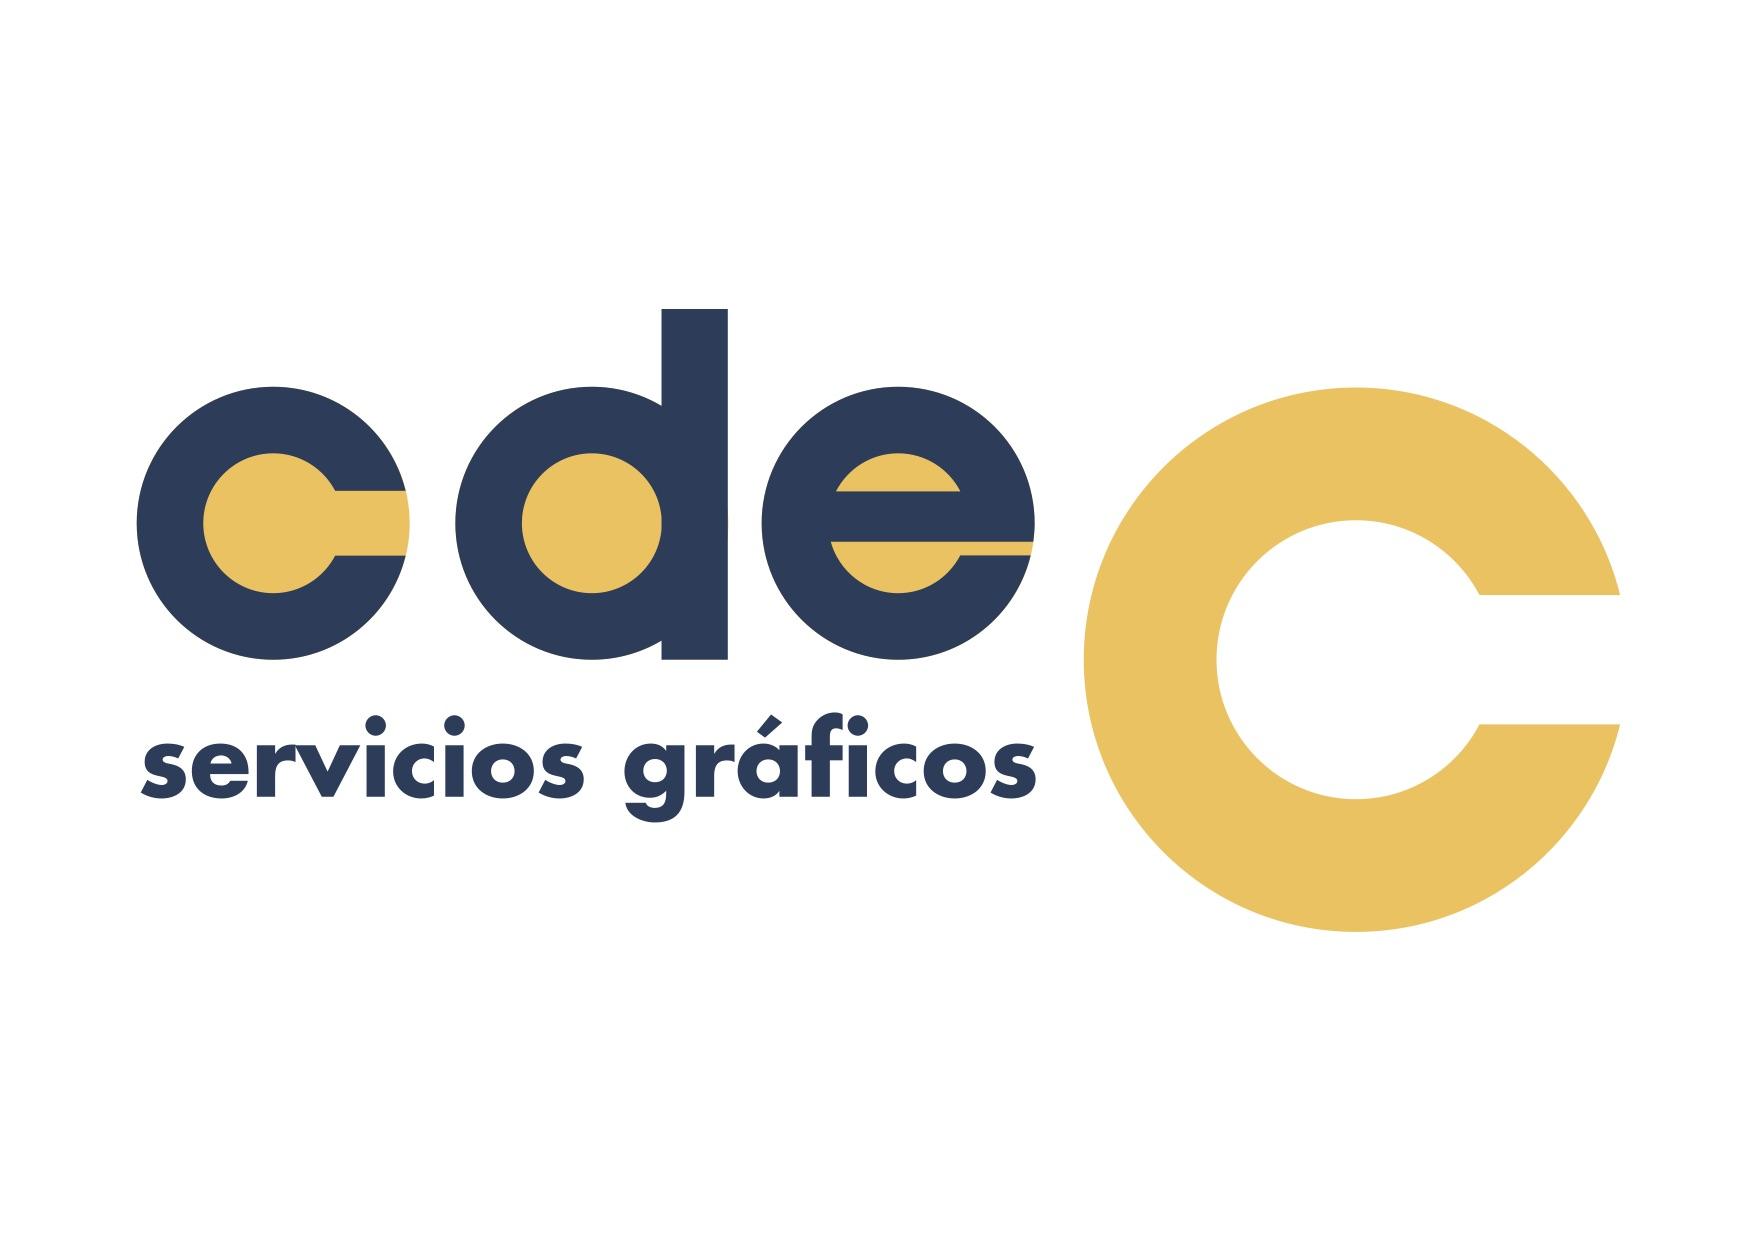 CdeC servicios gráficos